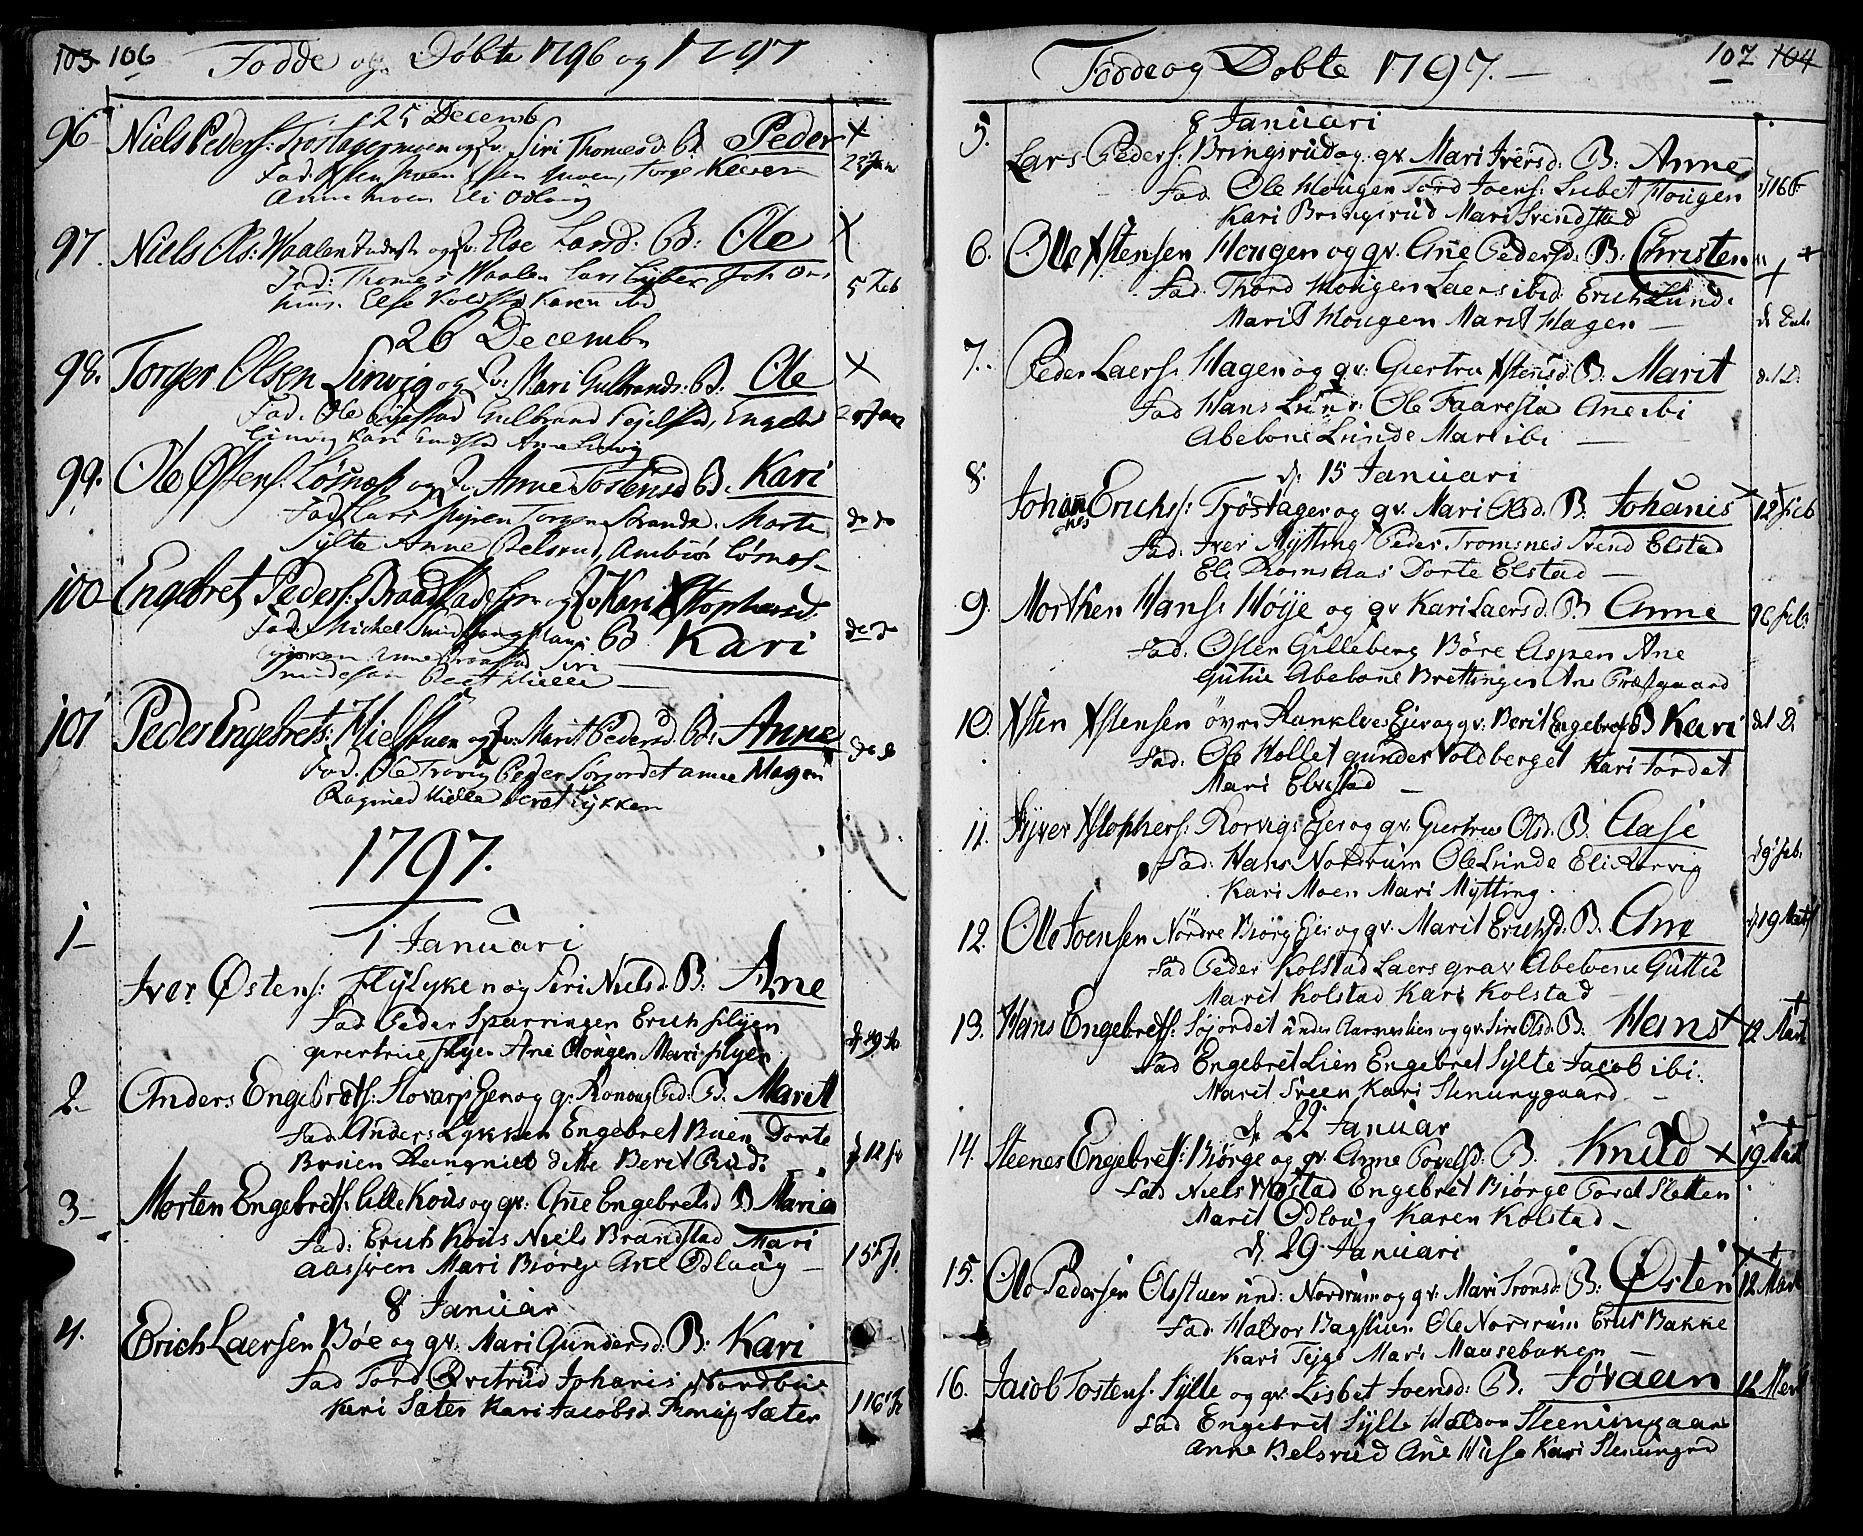 SAH, Ringebu prestekontor, Ministerialbok nr. 3, 1781-1820, s. 106-107